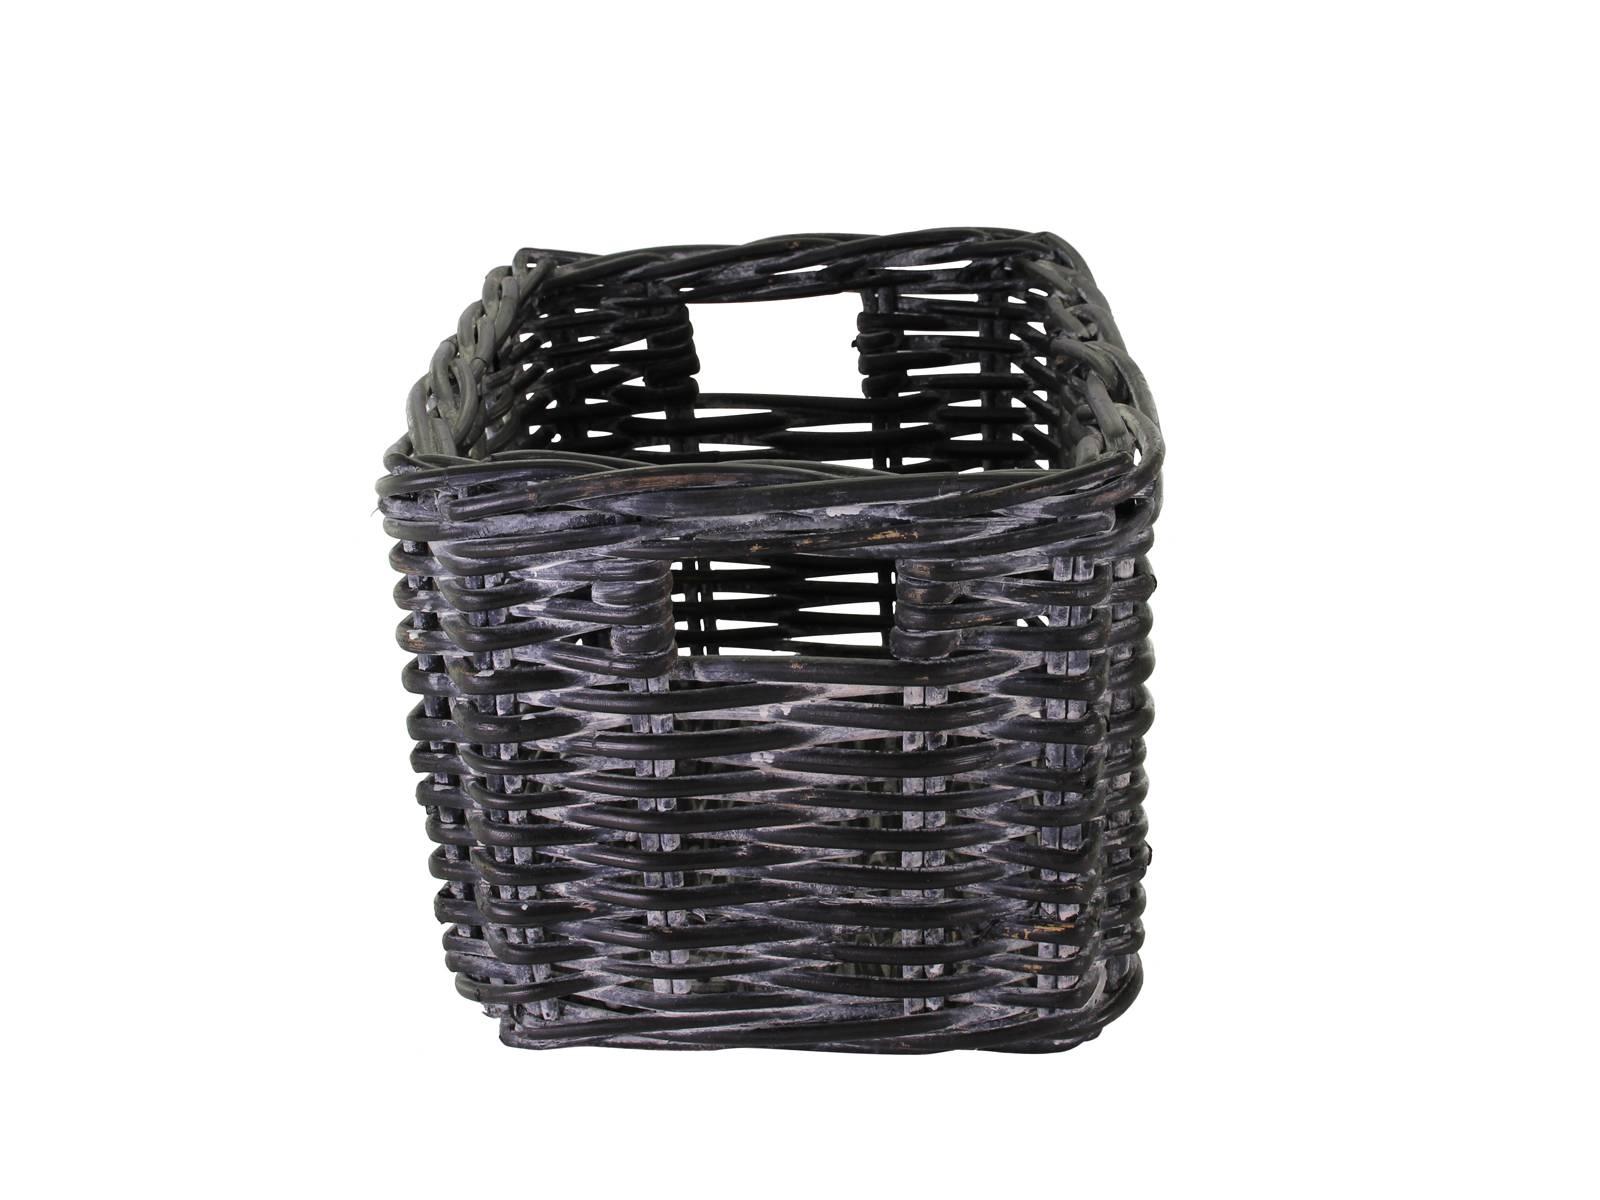 new looxs rattankorb brisbane fahrradkomfort. Black Bedroom Furniture Sets. Home Design Ideas